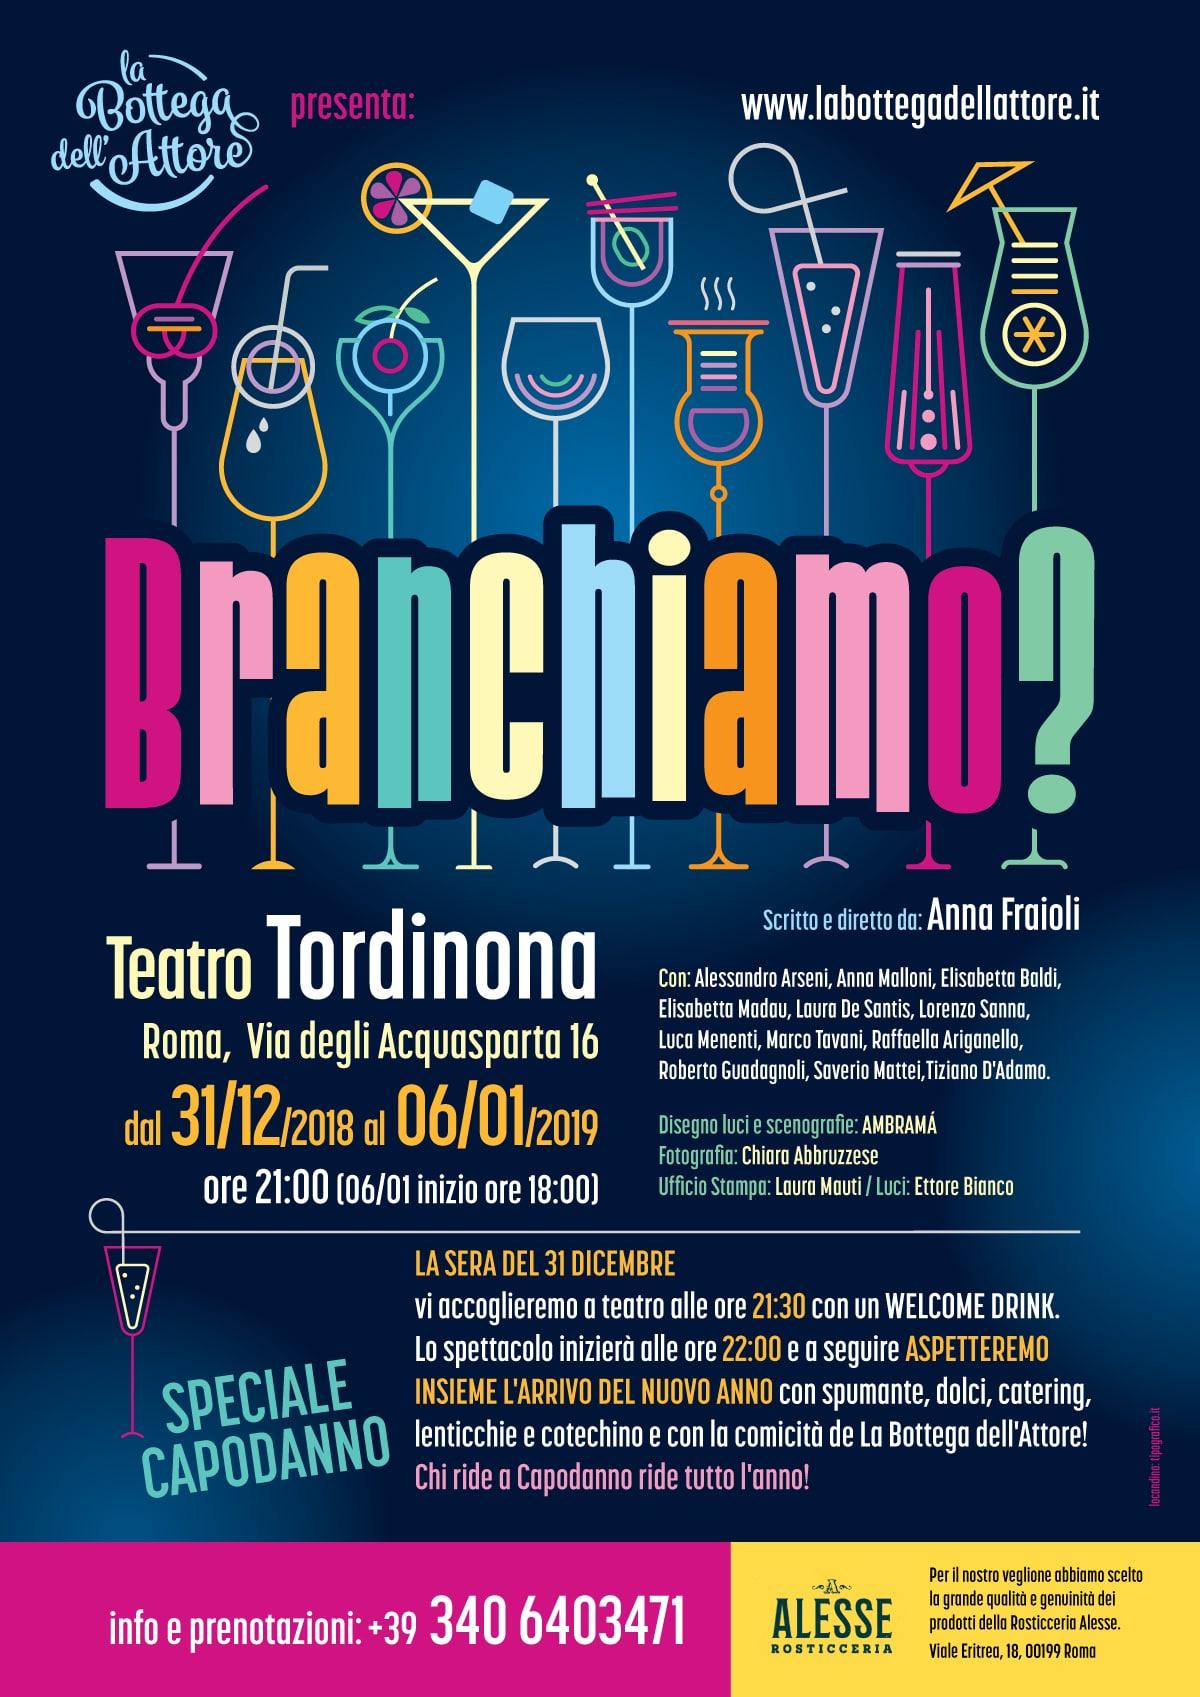 locandina-Branchiamo